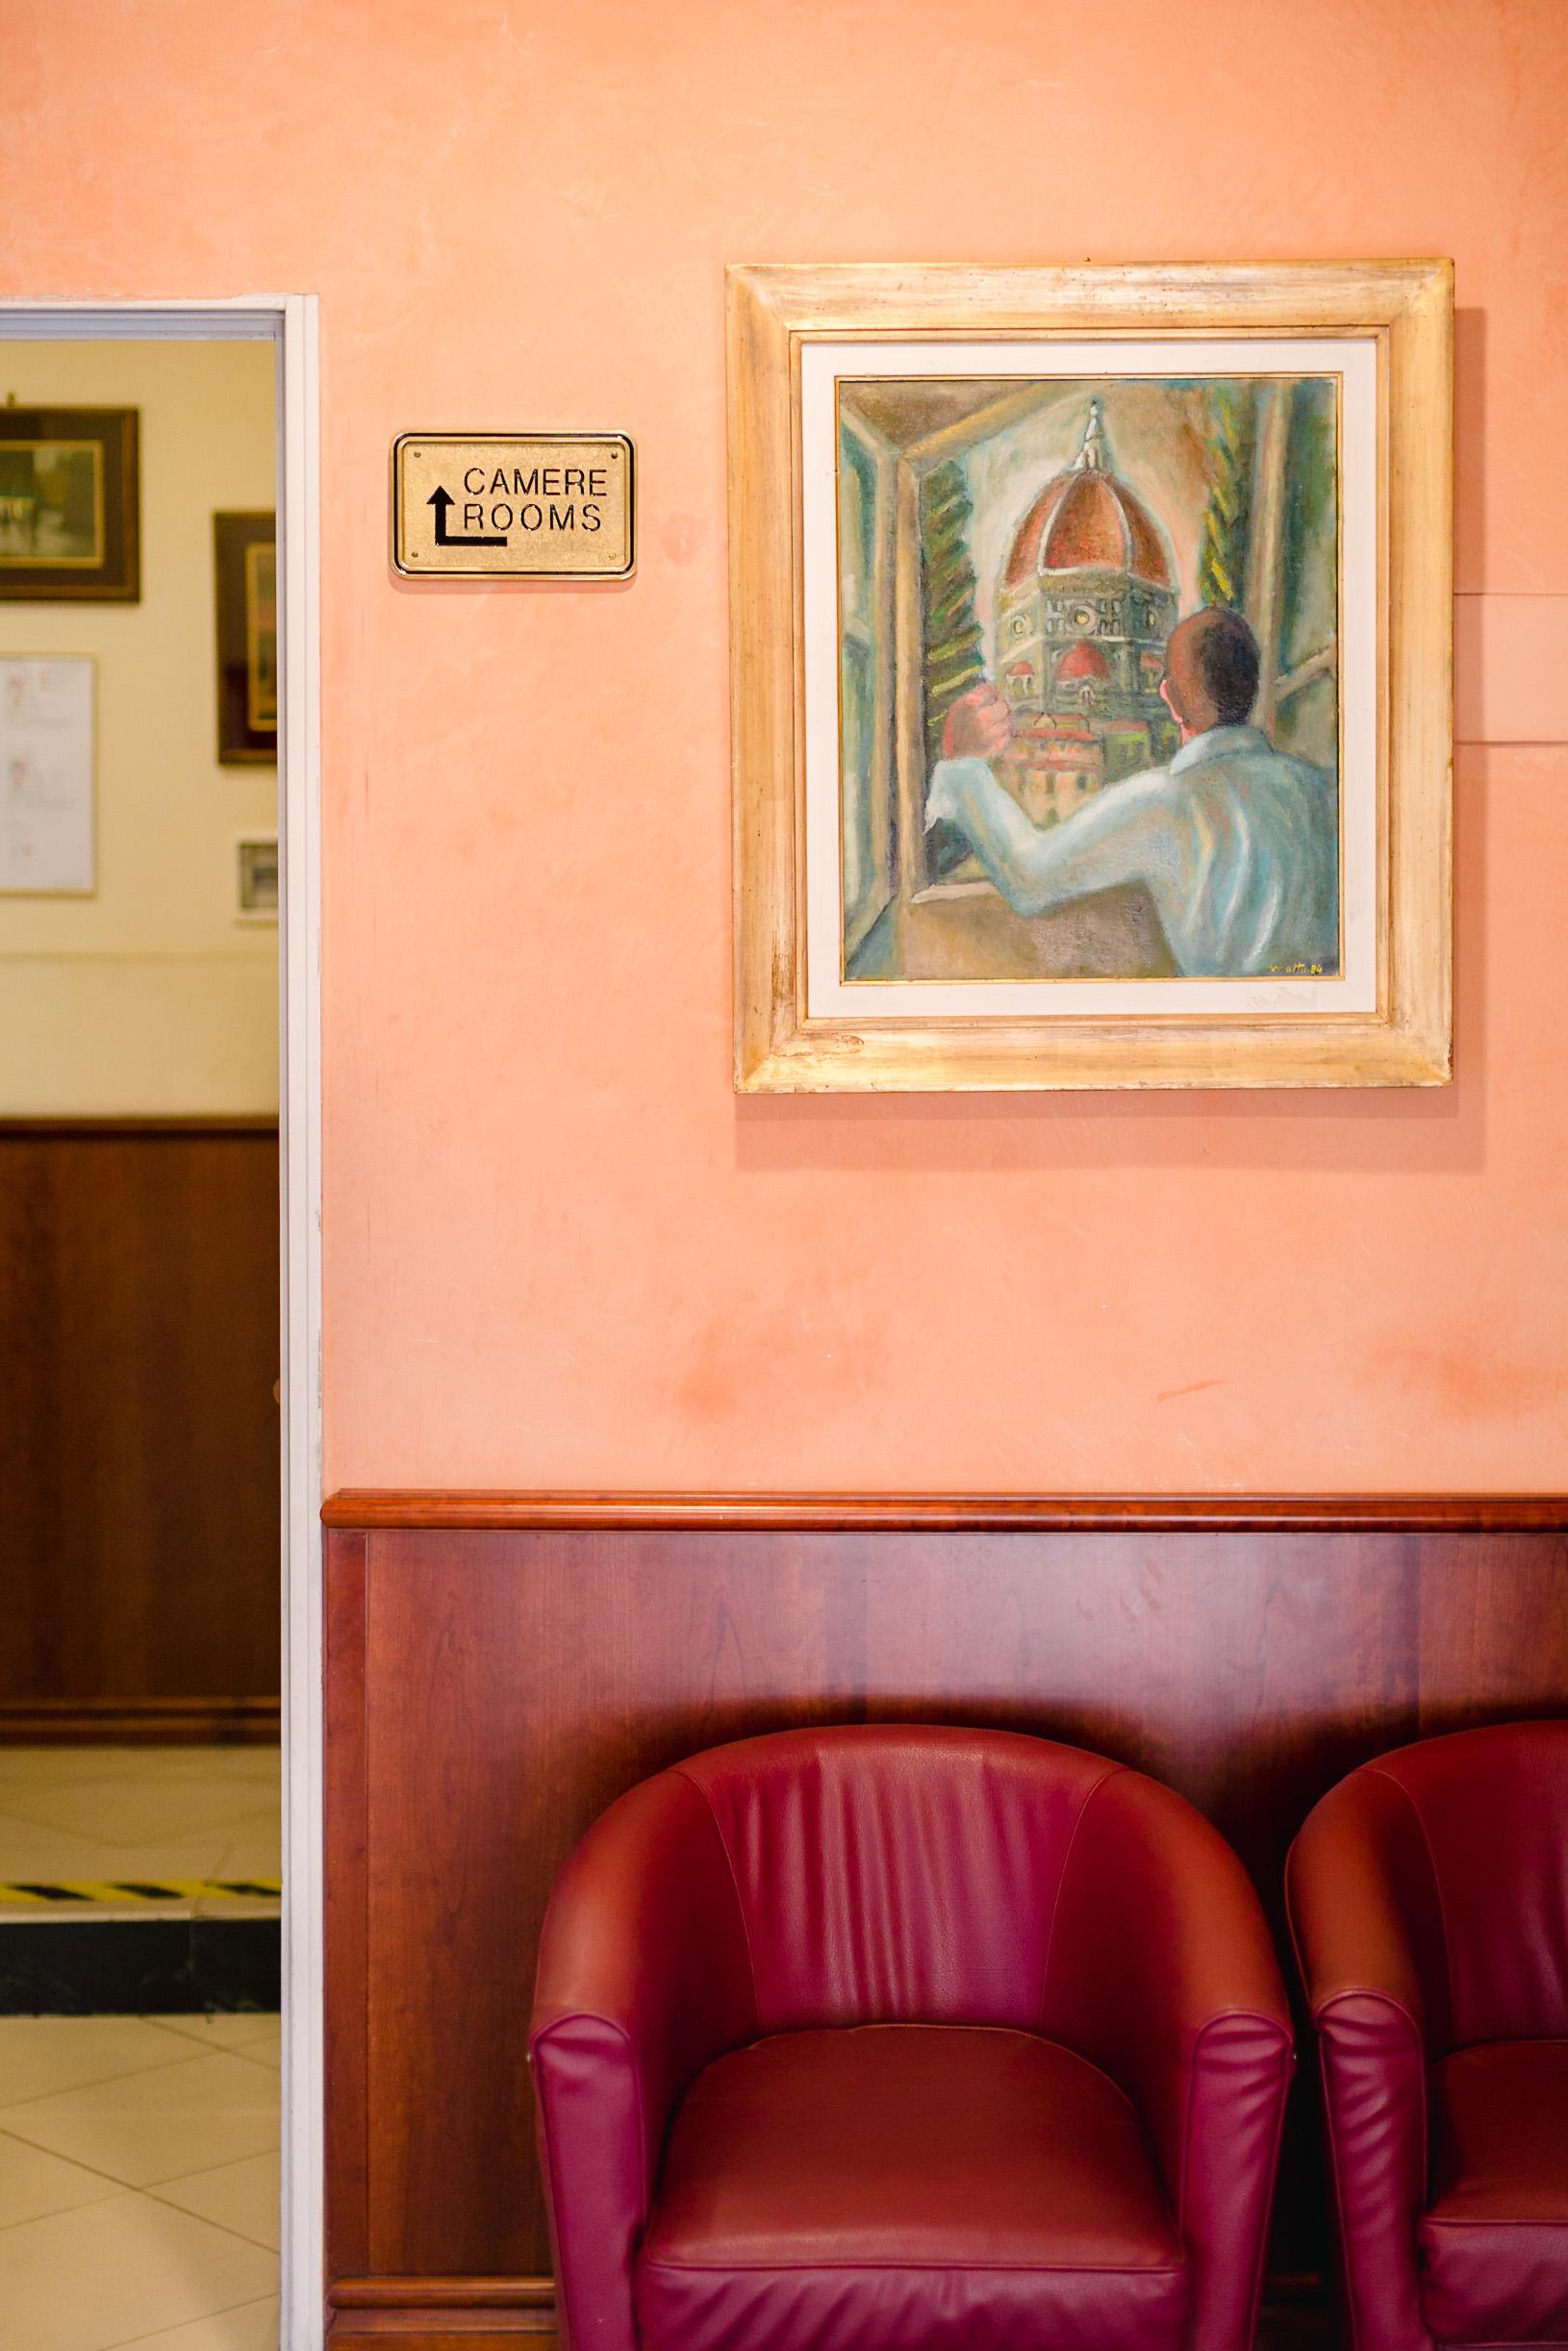 Hotel Arizona Florence — NICO SCHINCO